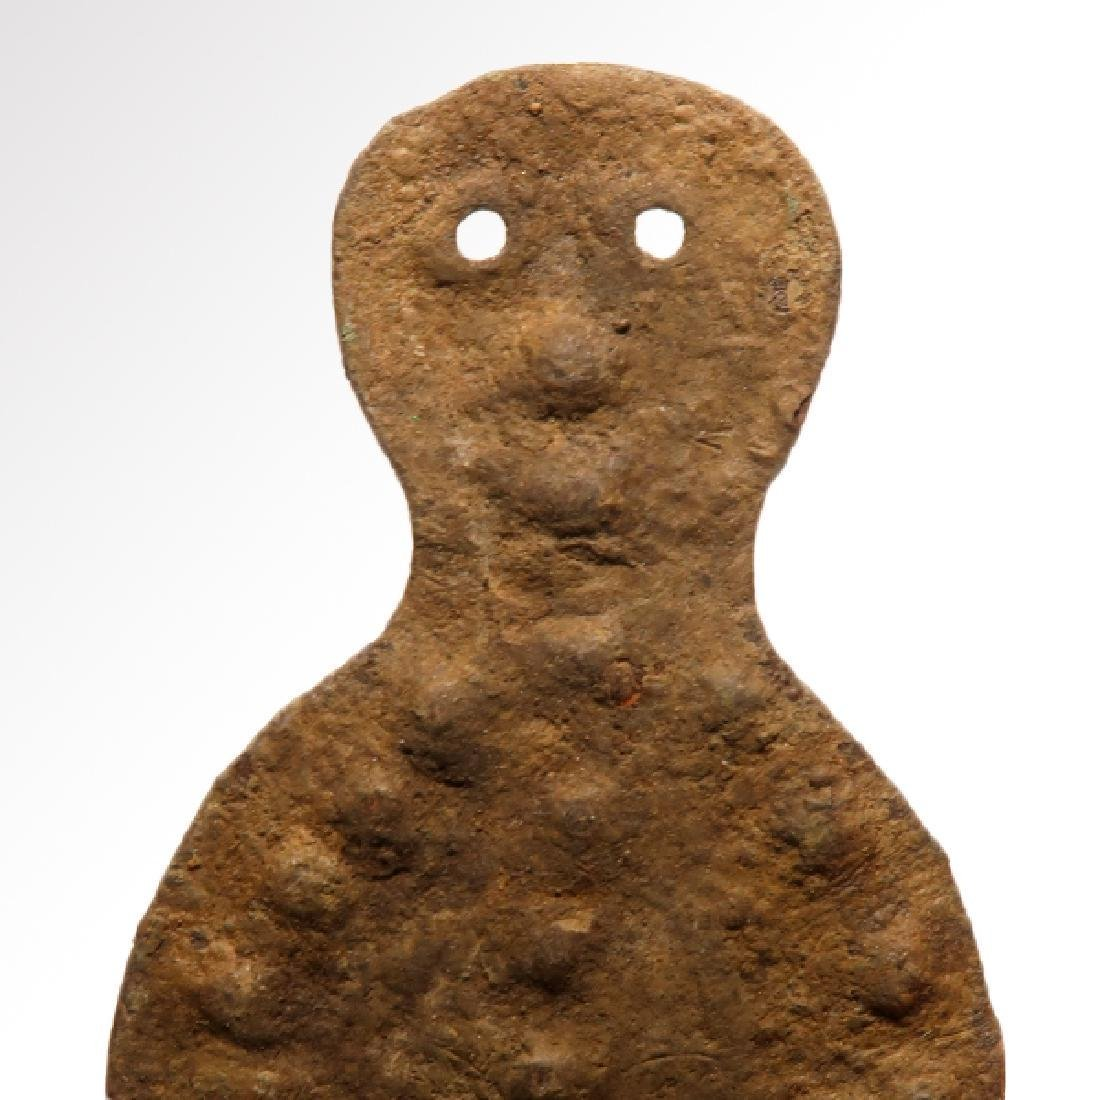 Anatolian Bronze Mother Godess Idol, c. 2500 B.C. - 2